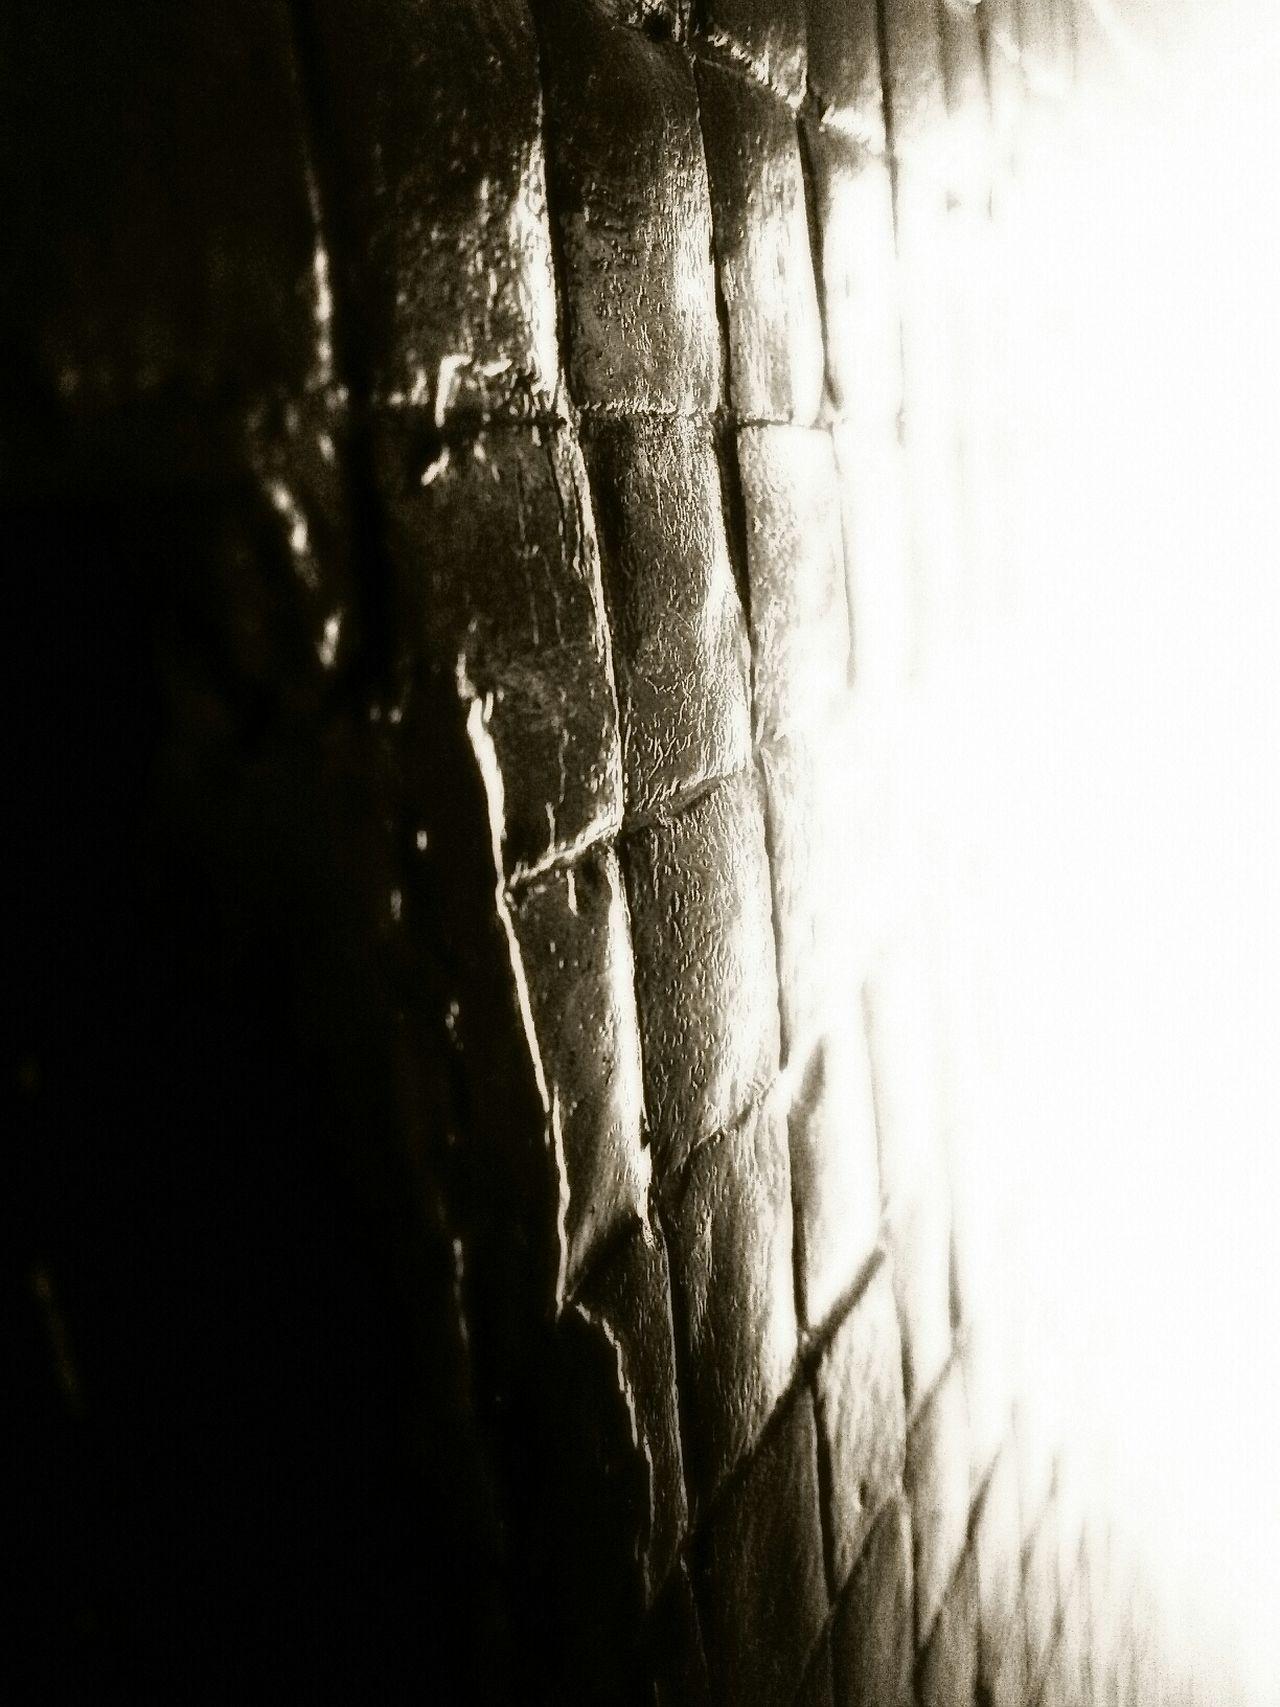 Against the wall. EyeEm Best Shots - Black + White Eye4photography  EyeEm Best Edits Texture